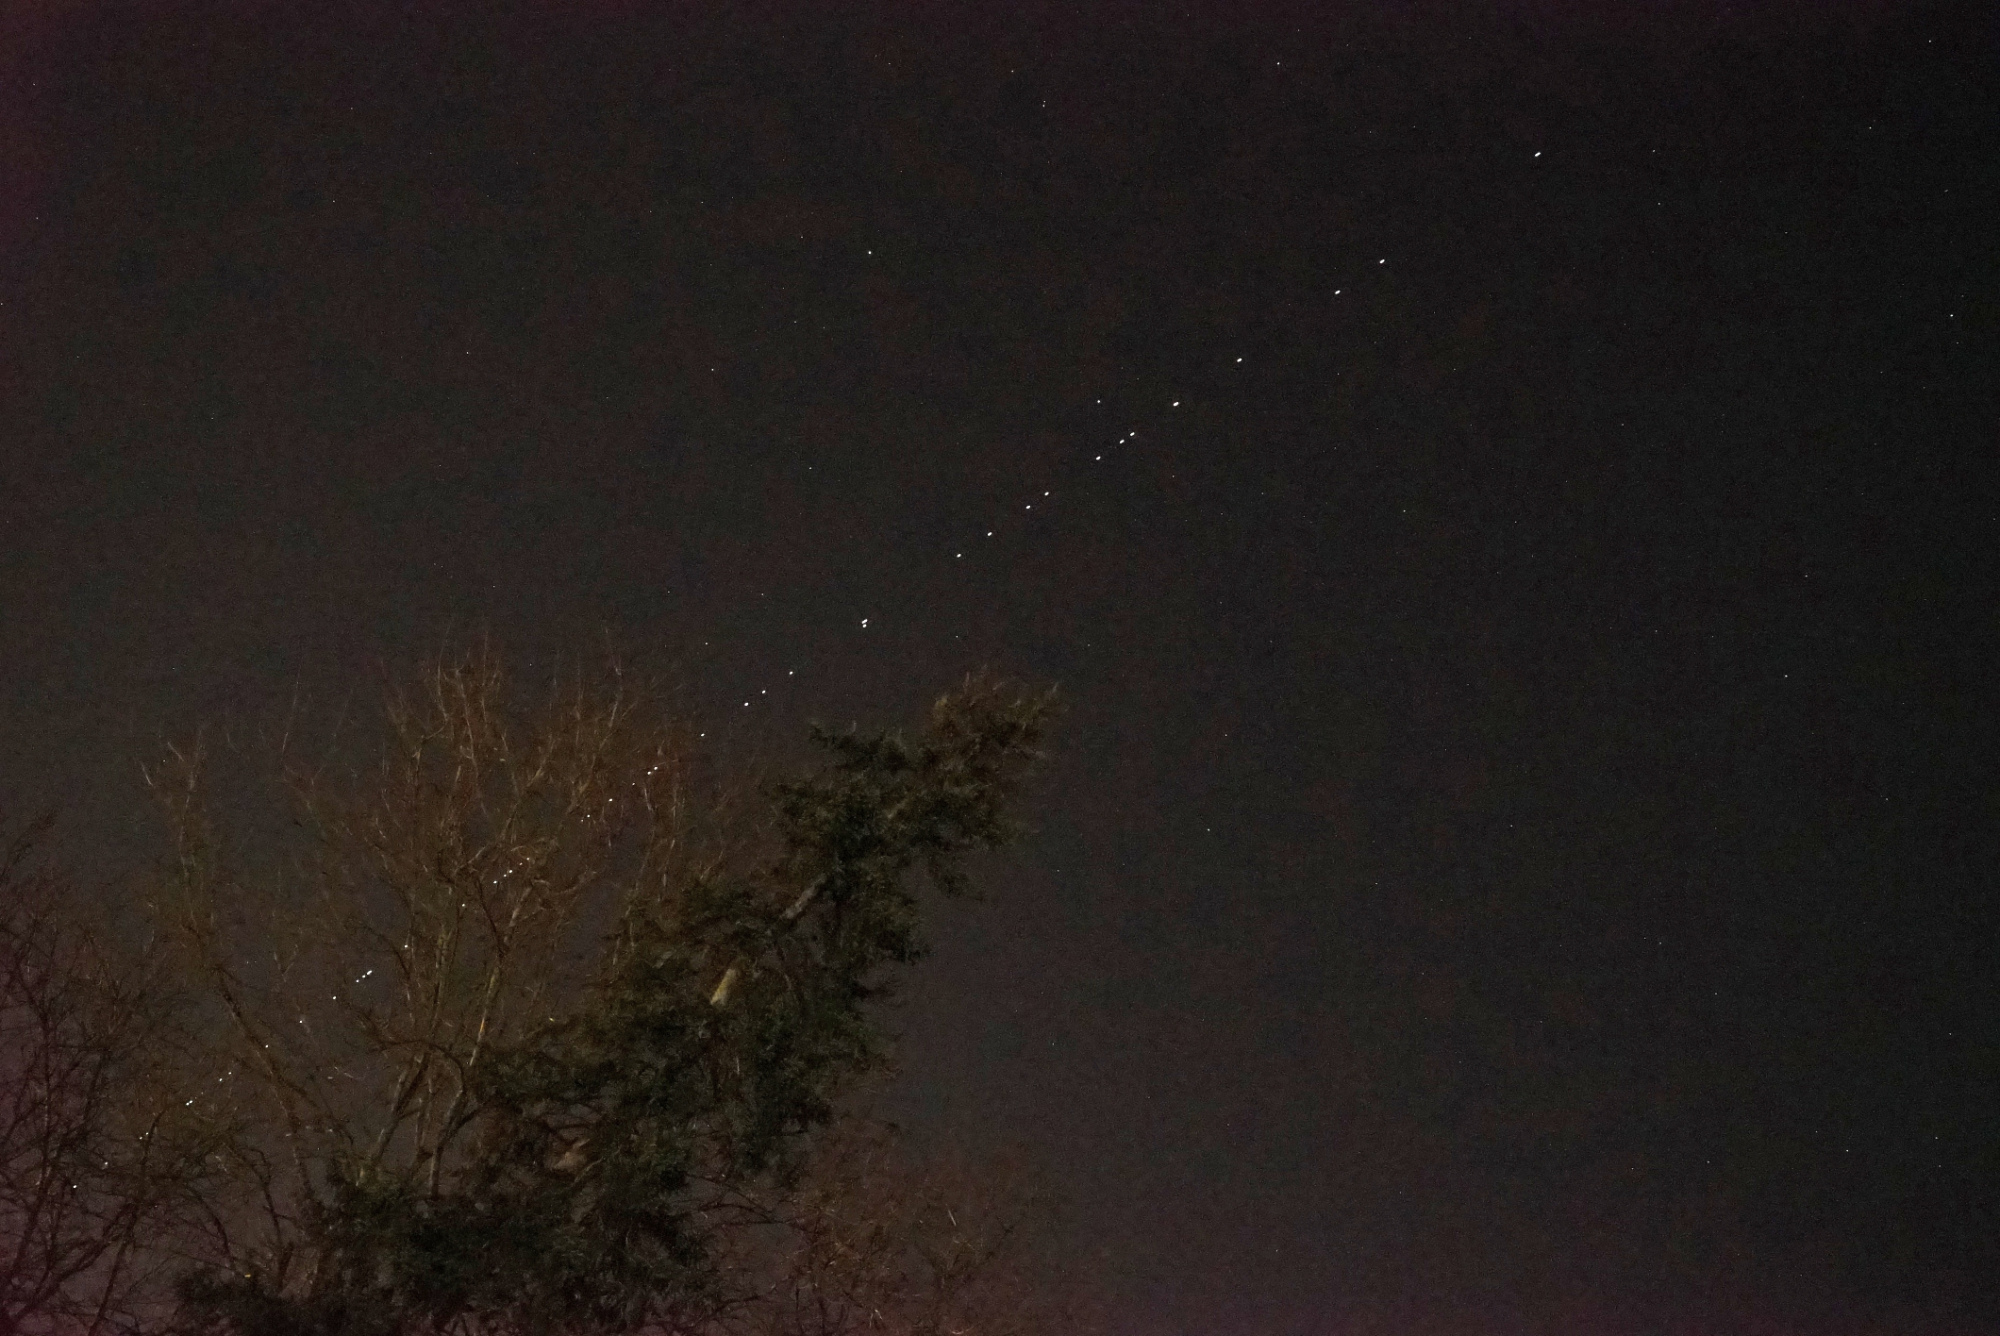 starlink-l22-270321-4h04m31s-43mmf4b-0p08s.thumb.jpg.9be844589ea4f8ba866edc2bbc1efe7a.jpg